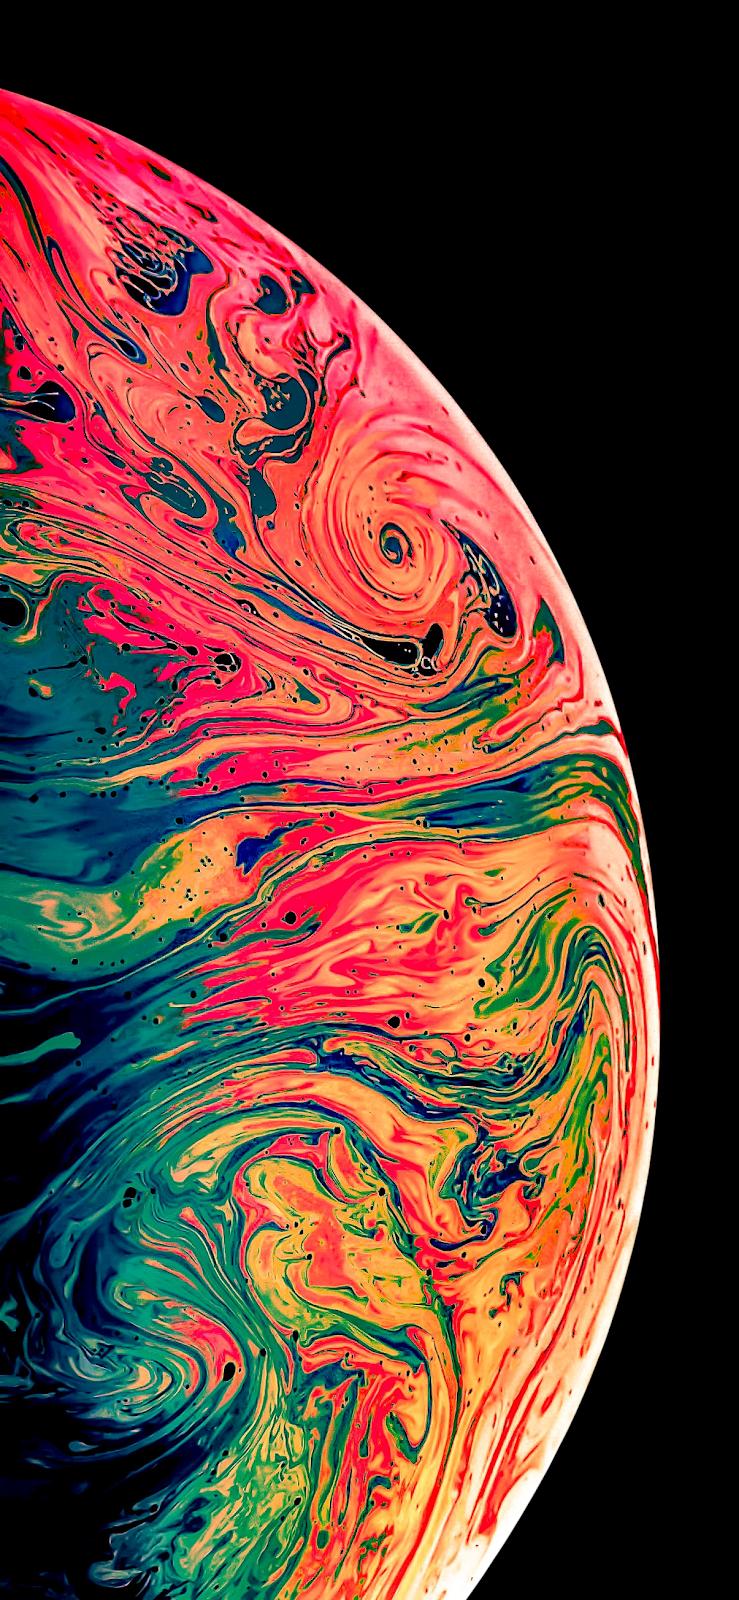 iPhone XS MAX Modd (Dark) by AR72014